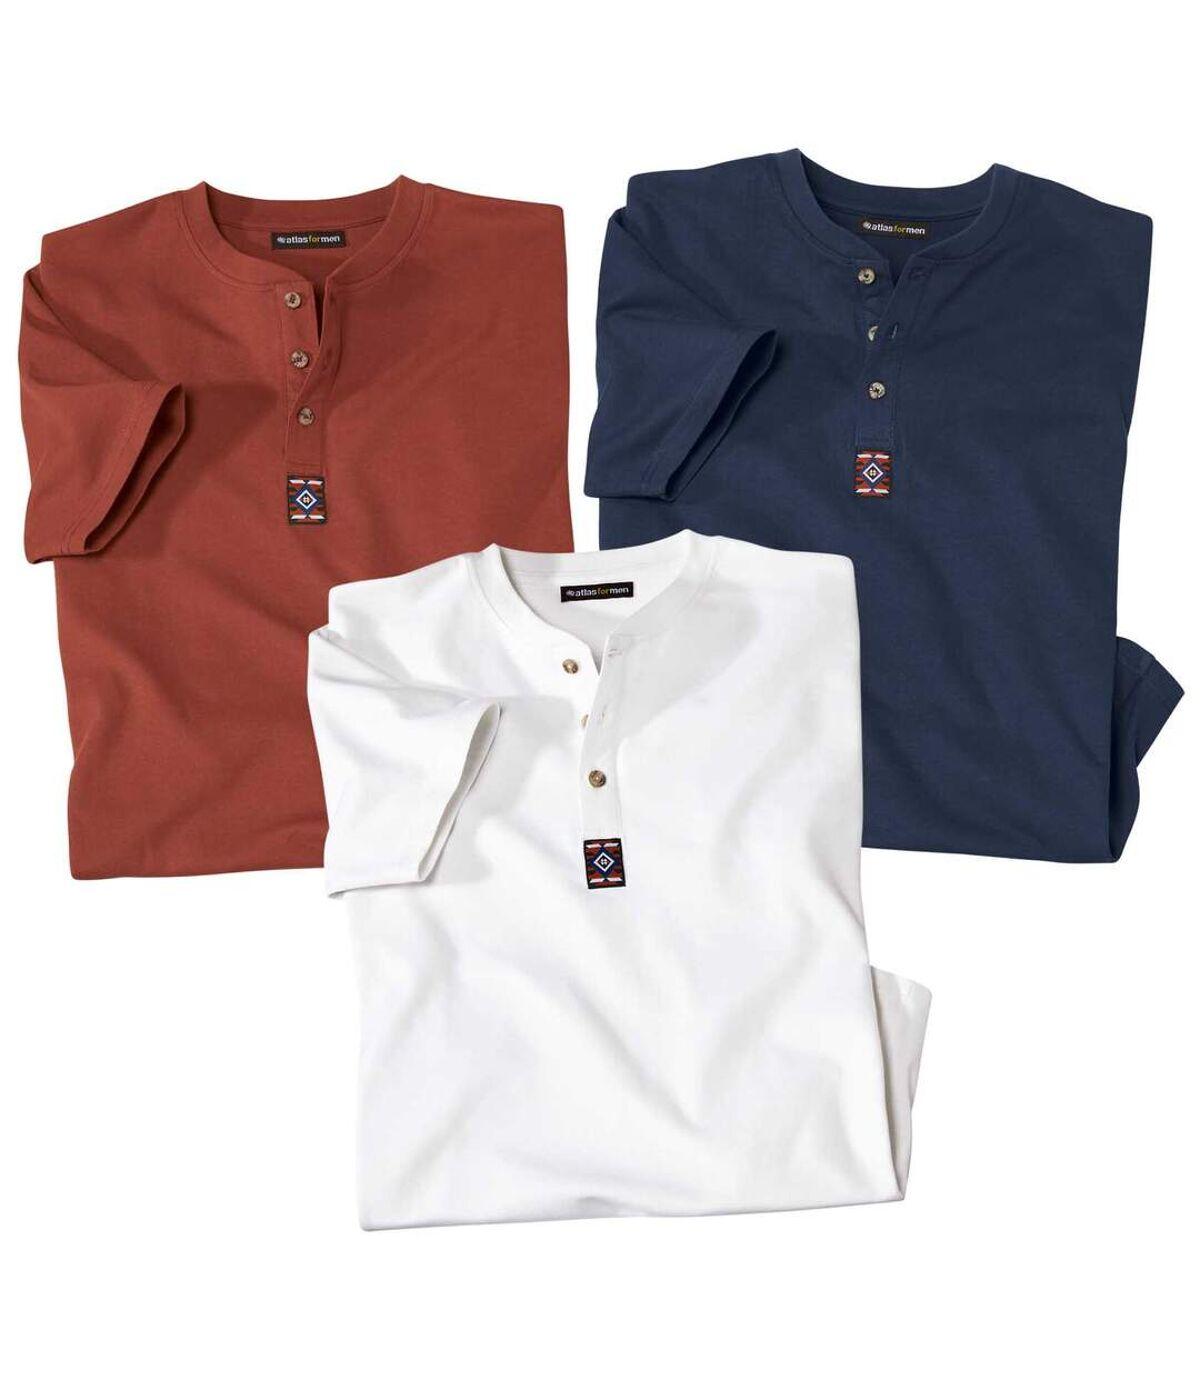 Pack of 3 Men's Button-Neck T-Shirts - Ecru Red Navy Atlas For Men